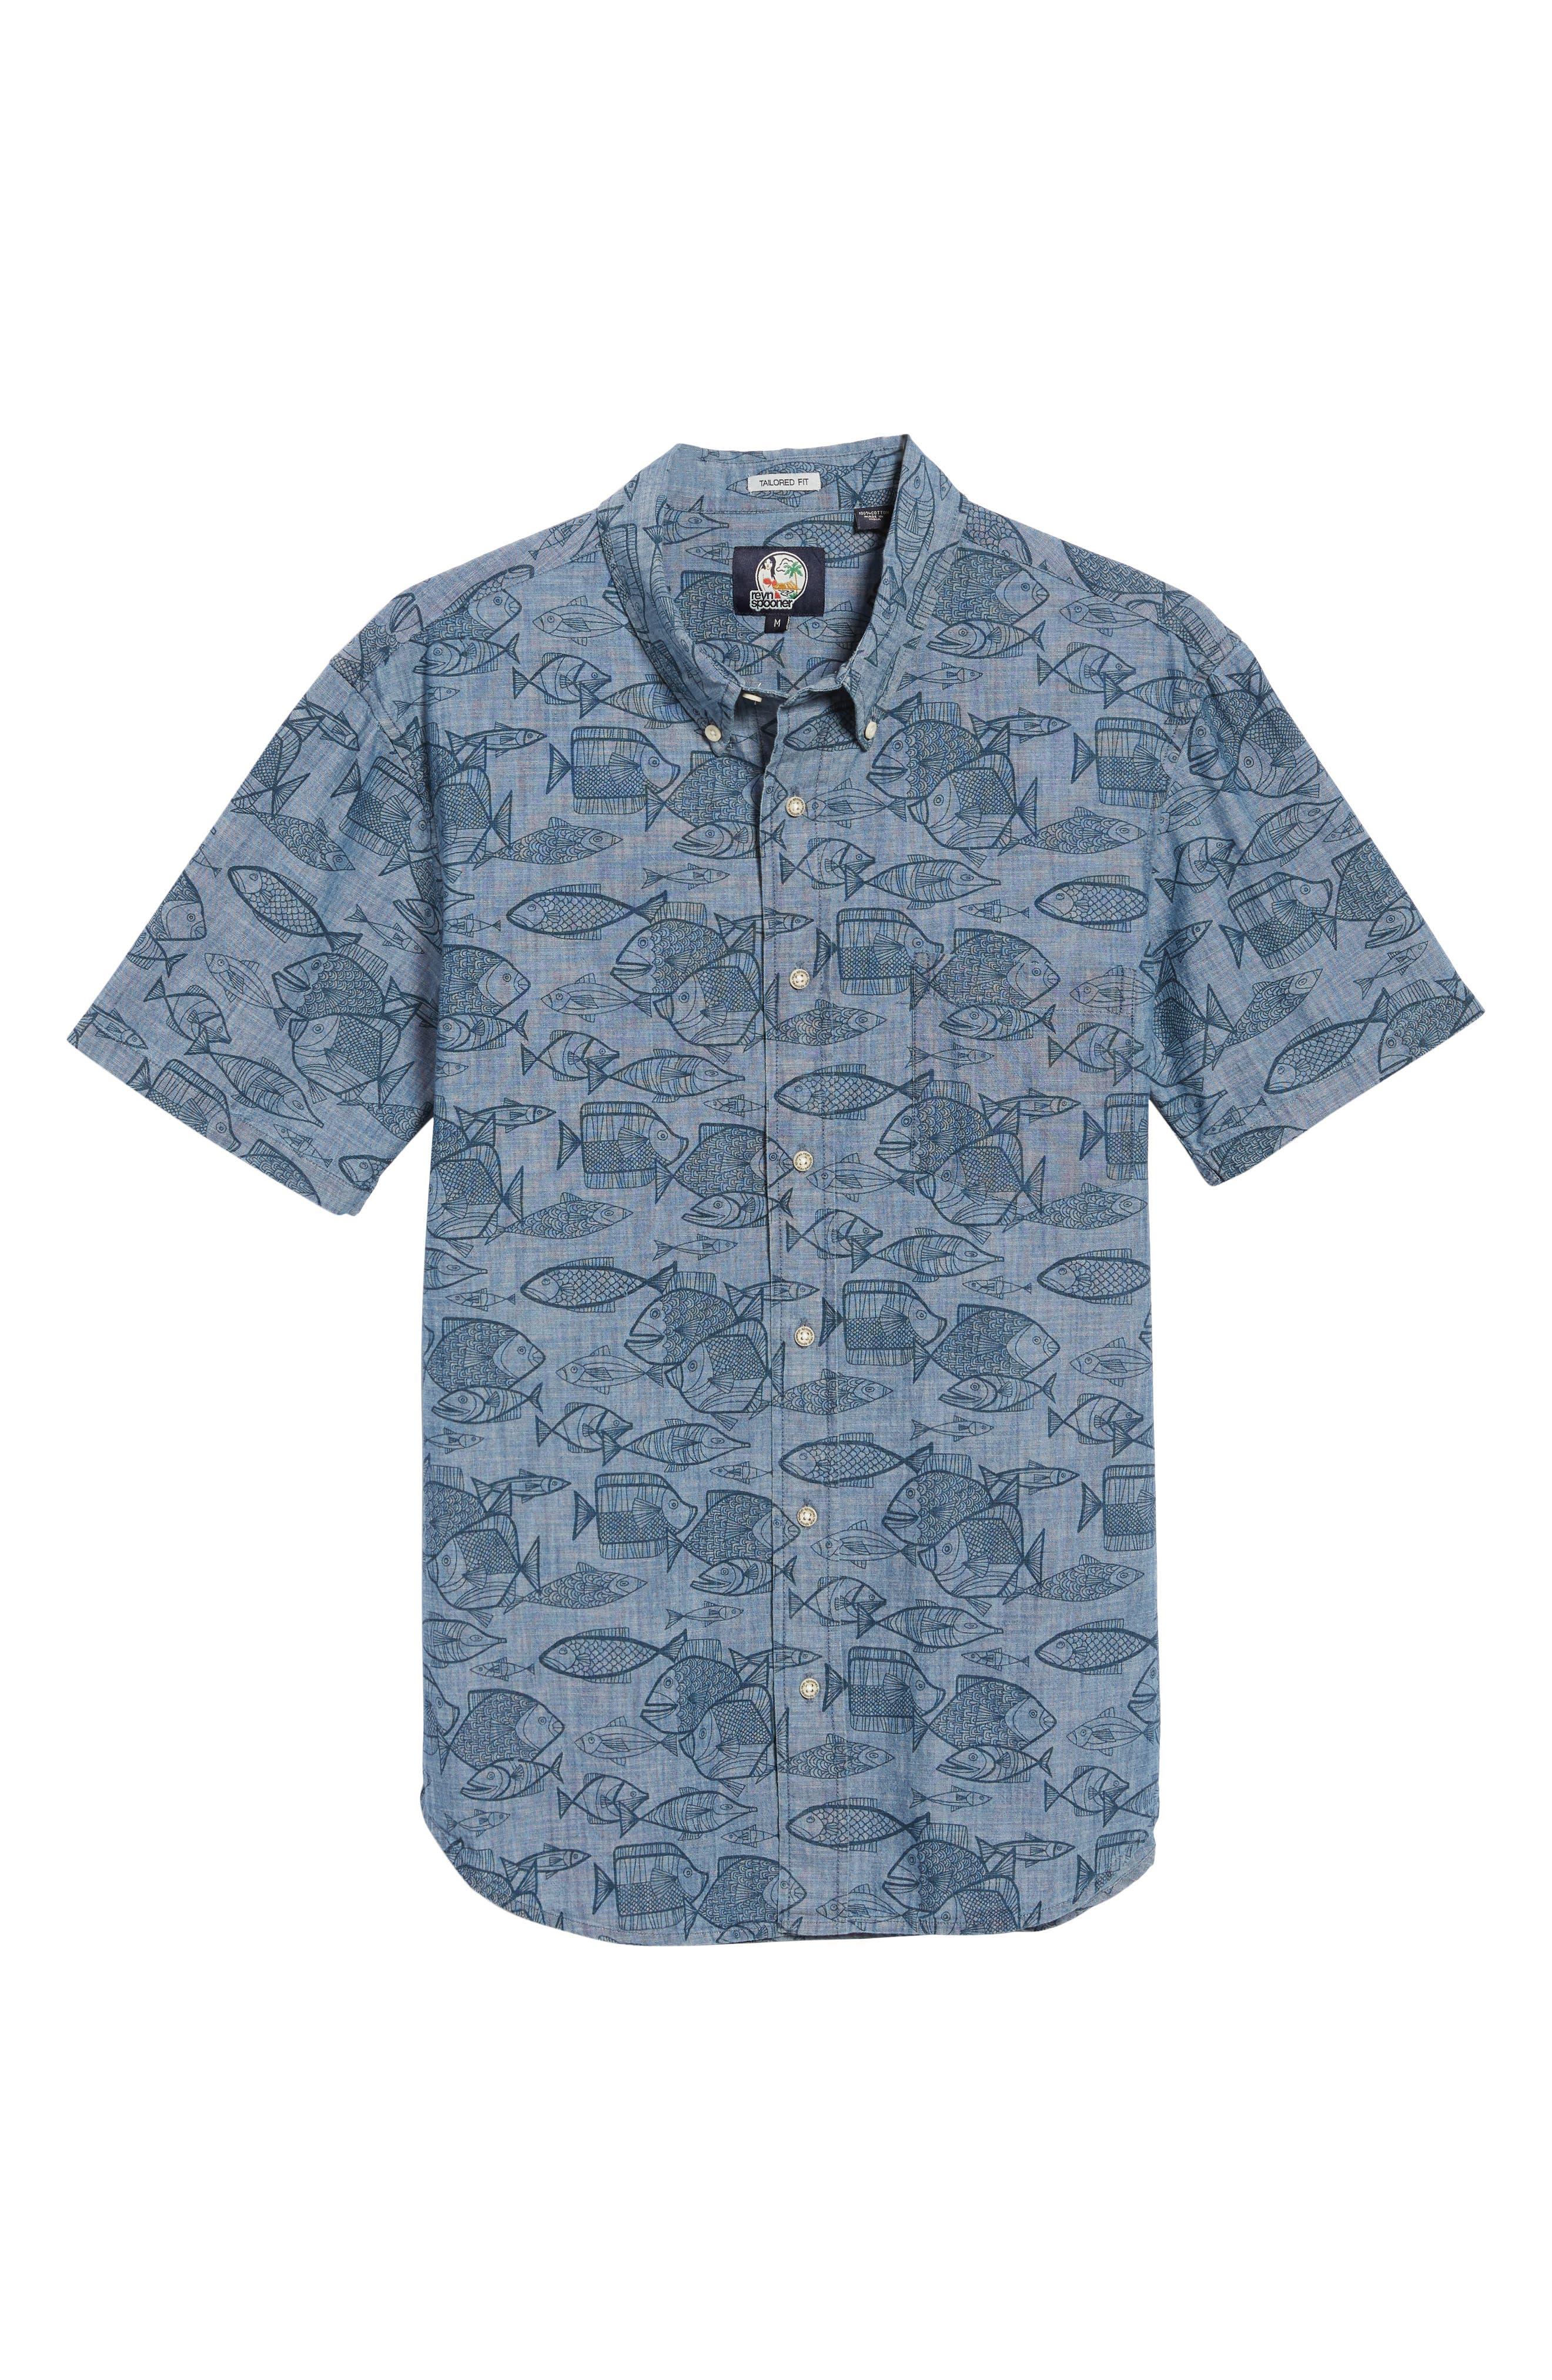 REYN SPOONER, Kauhulu Tailored Fit Sport Shirt, Alternate thumbnail 5, color, CHAMBRAY BLUE